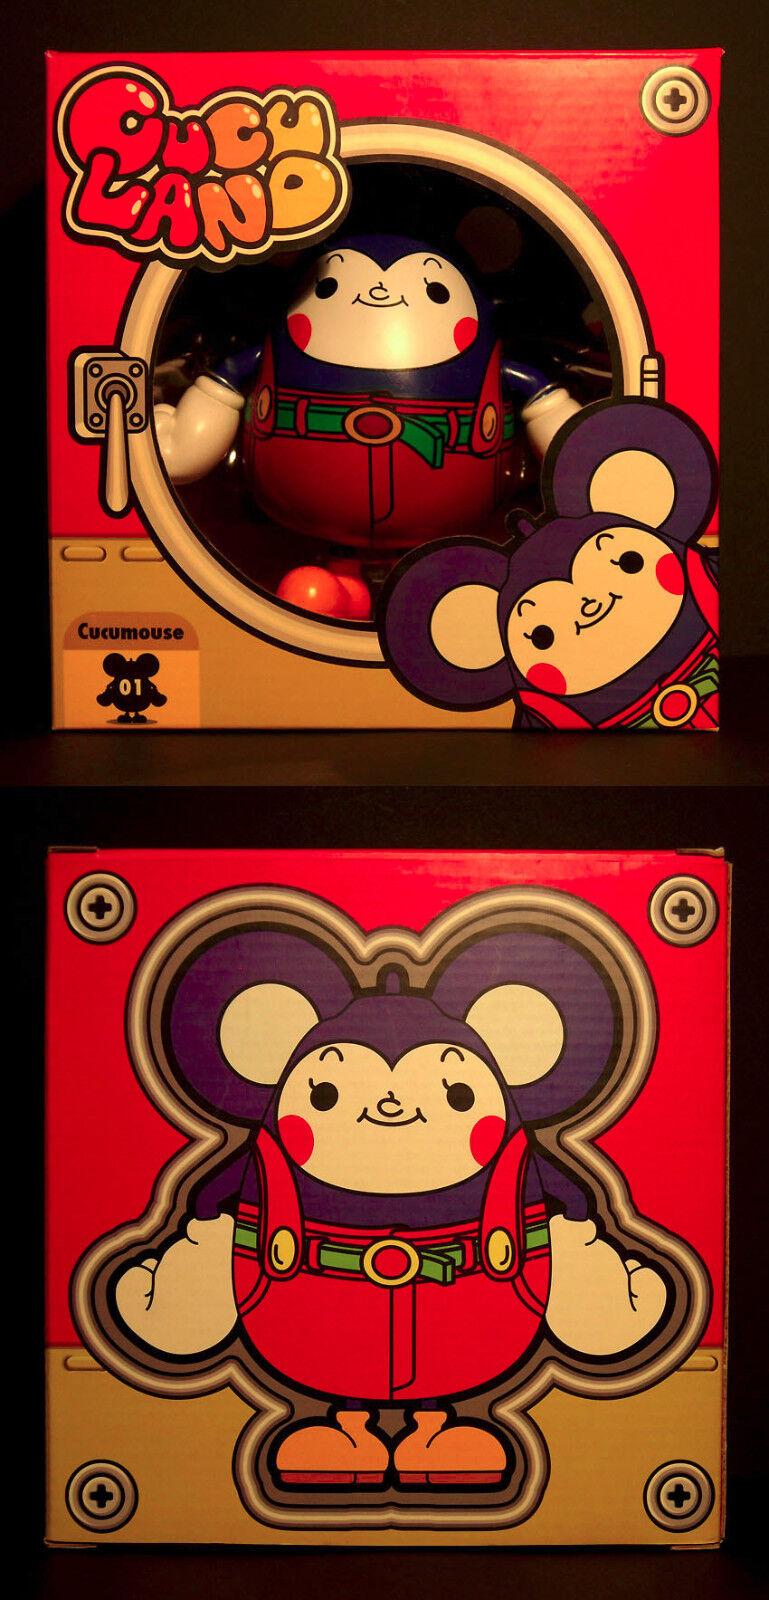 CucuMouse - Edition 2006 - Toy2R 6  Vinyl Figure by Kei Sawada